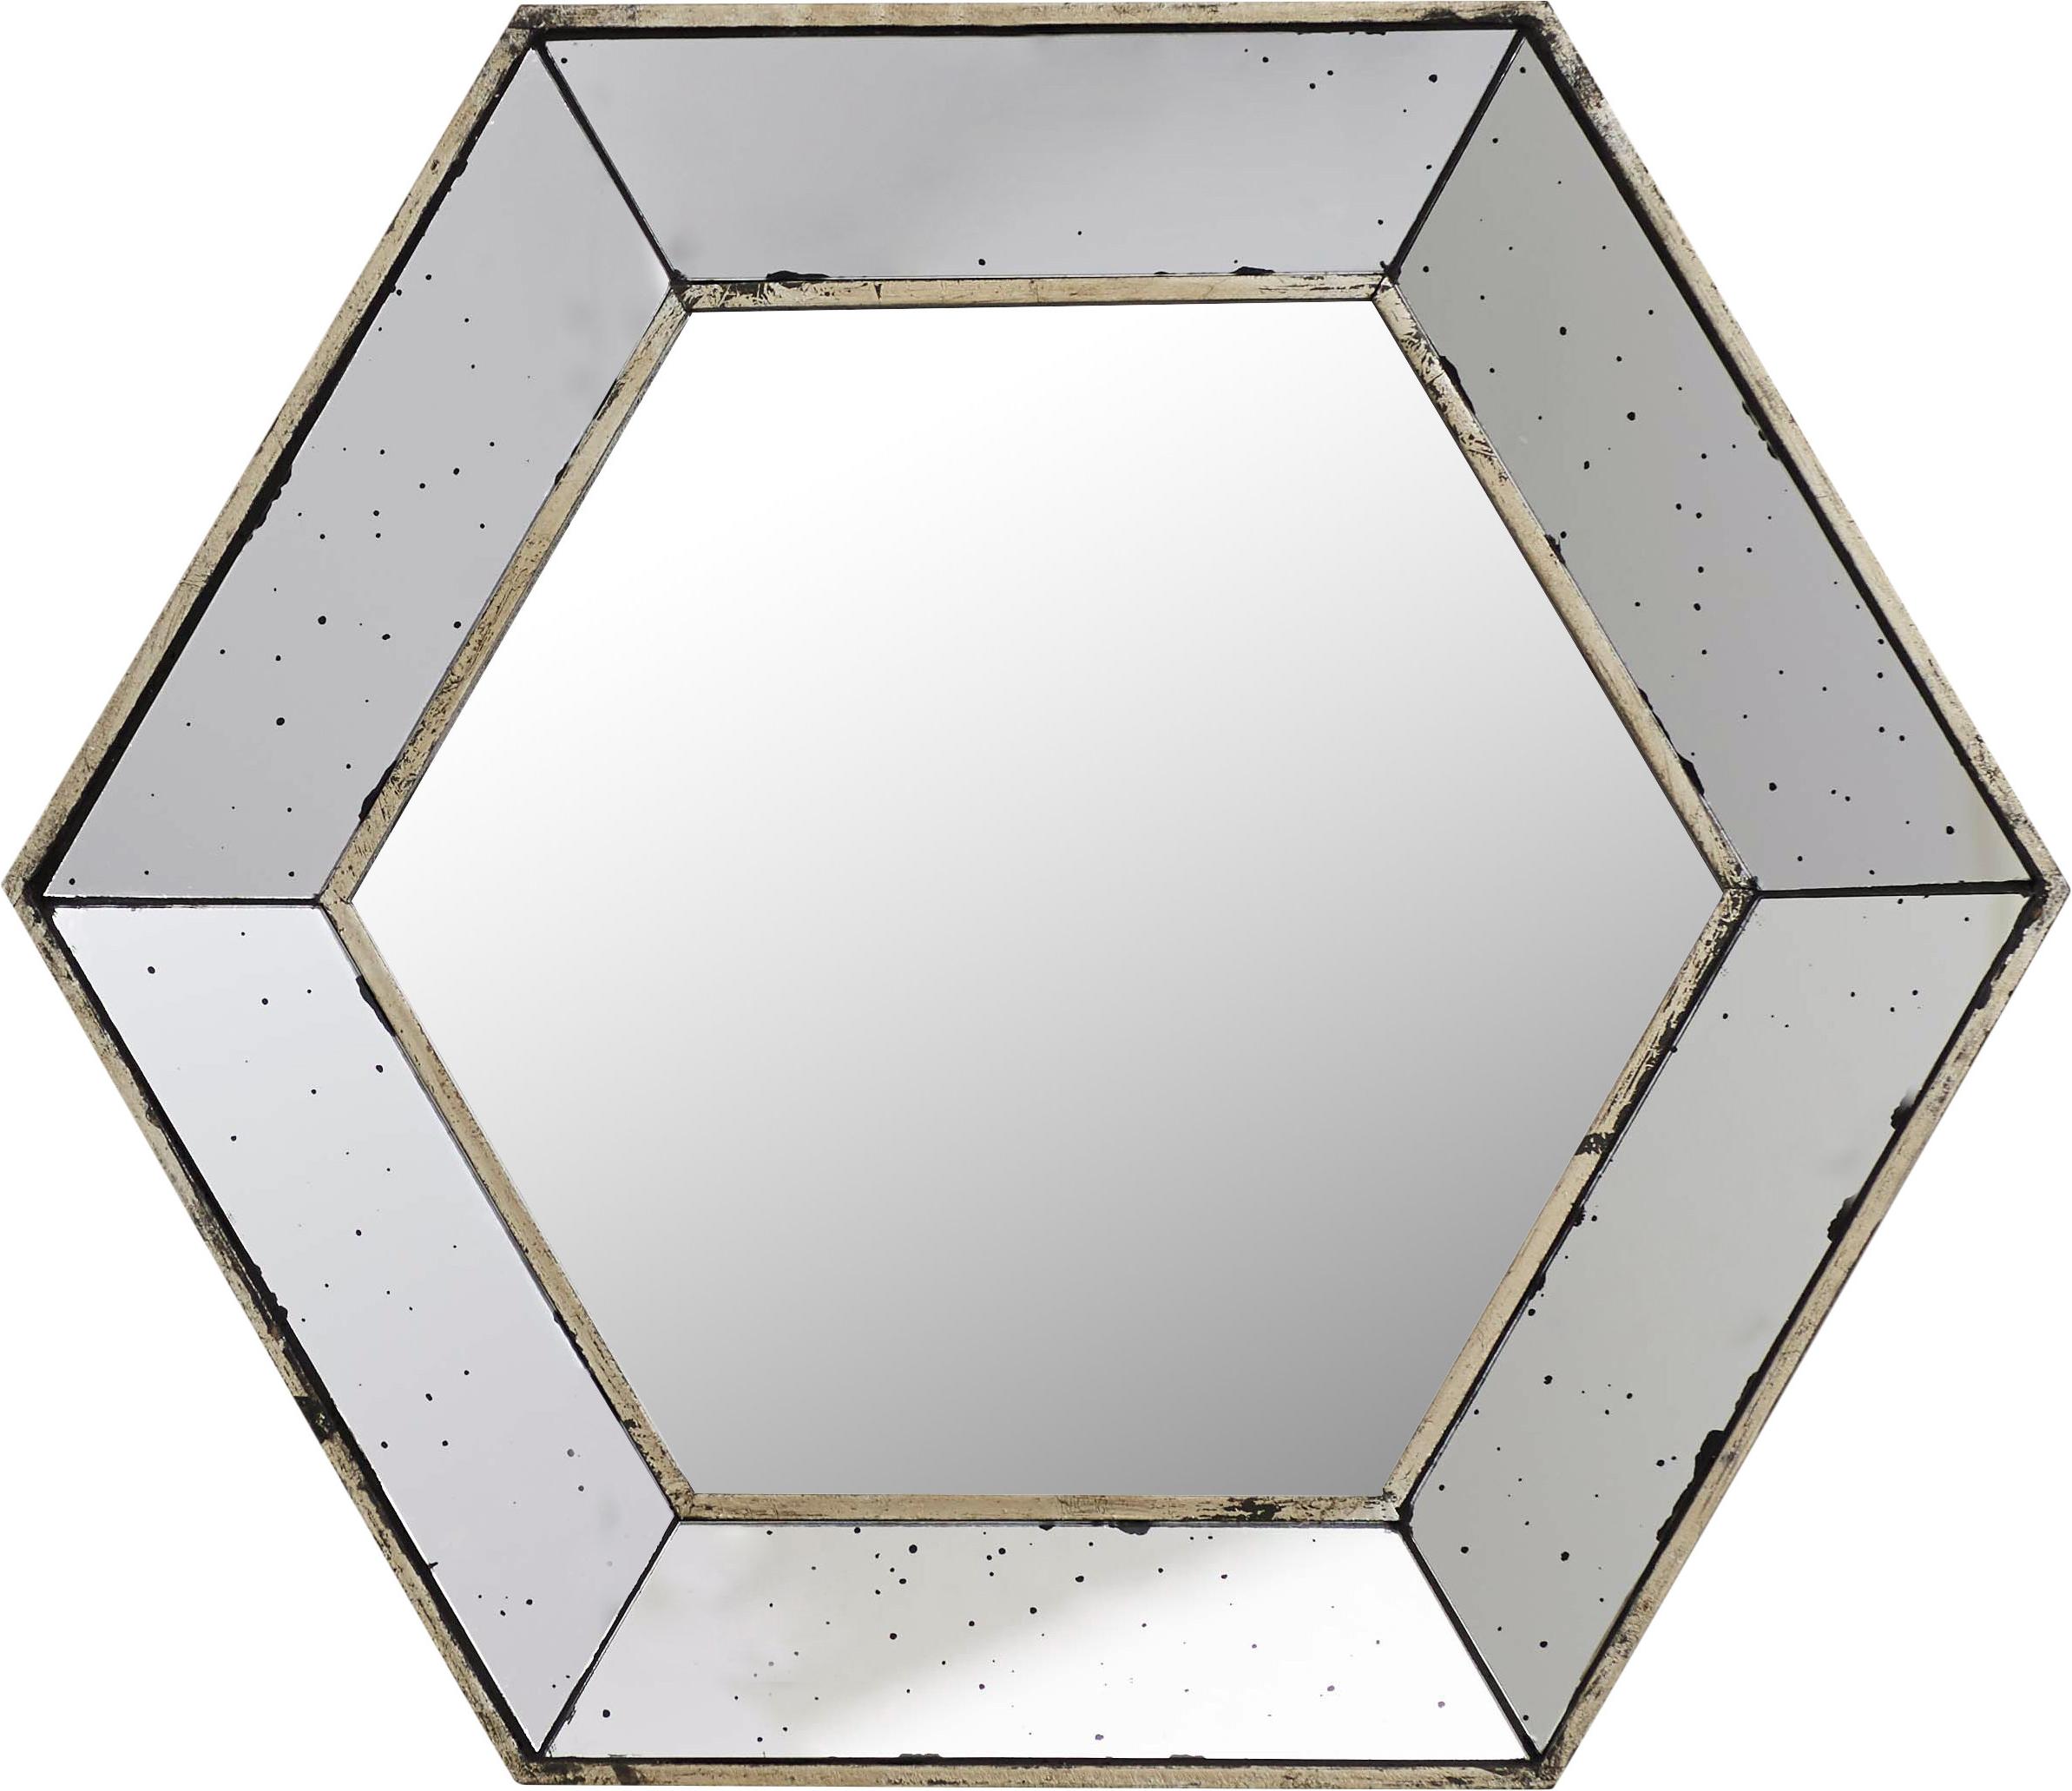 Trendy Gia Hexagon Accent Mirrors With Gia Hexagon Accent Mirror (View 16 of 20)